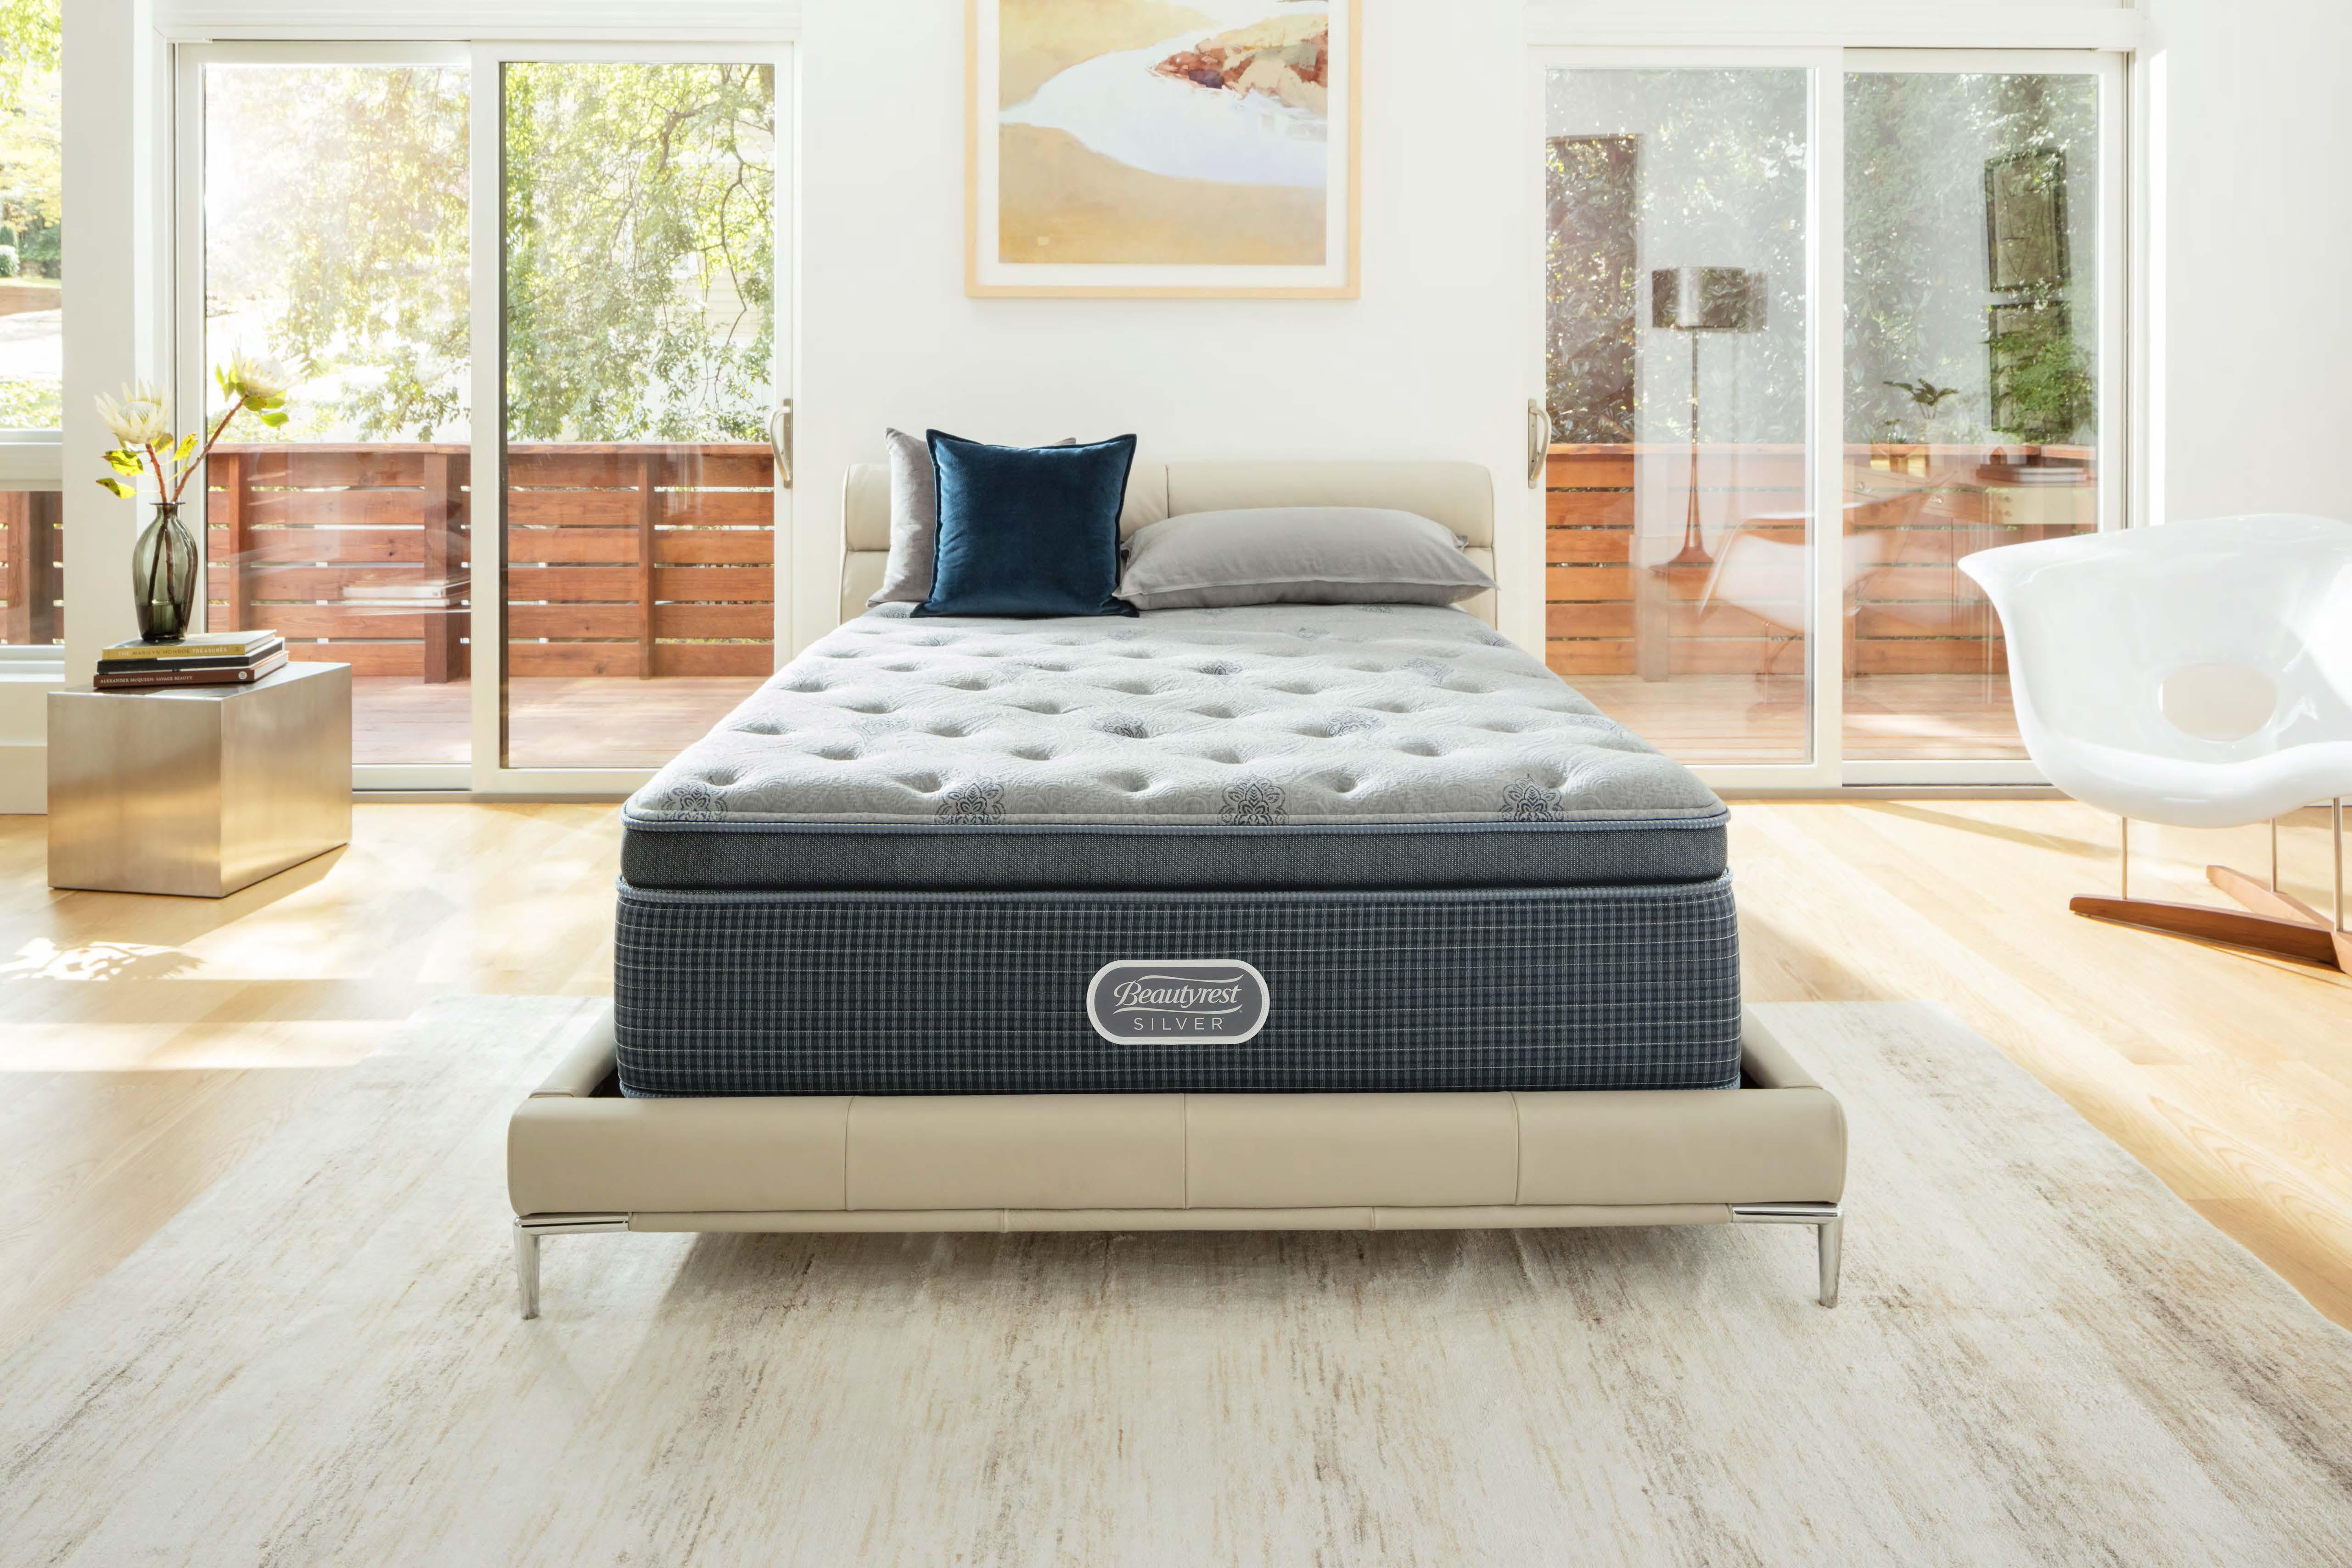 Soda city mattress furniture columbia south carolina for Furniture mattress city